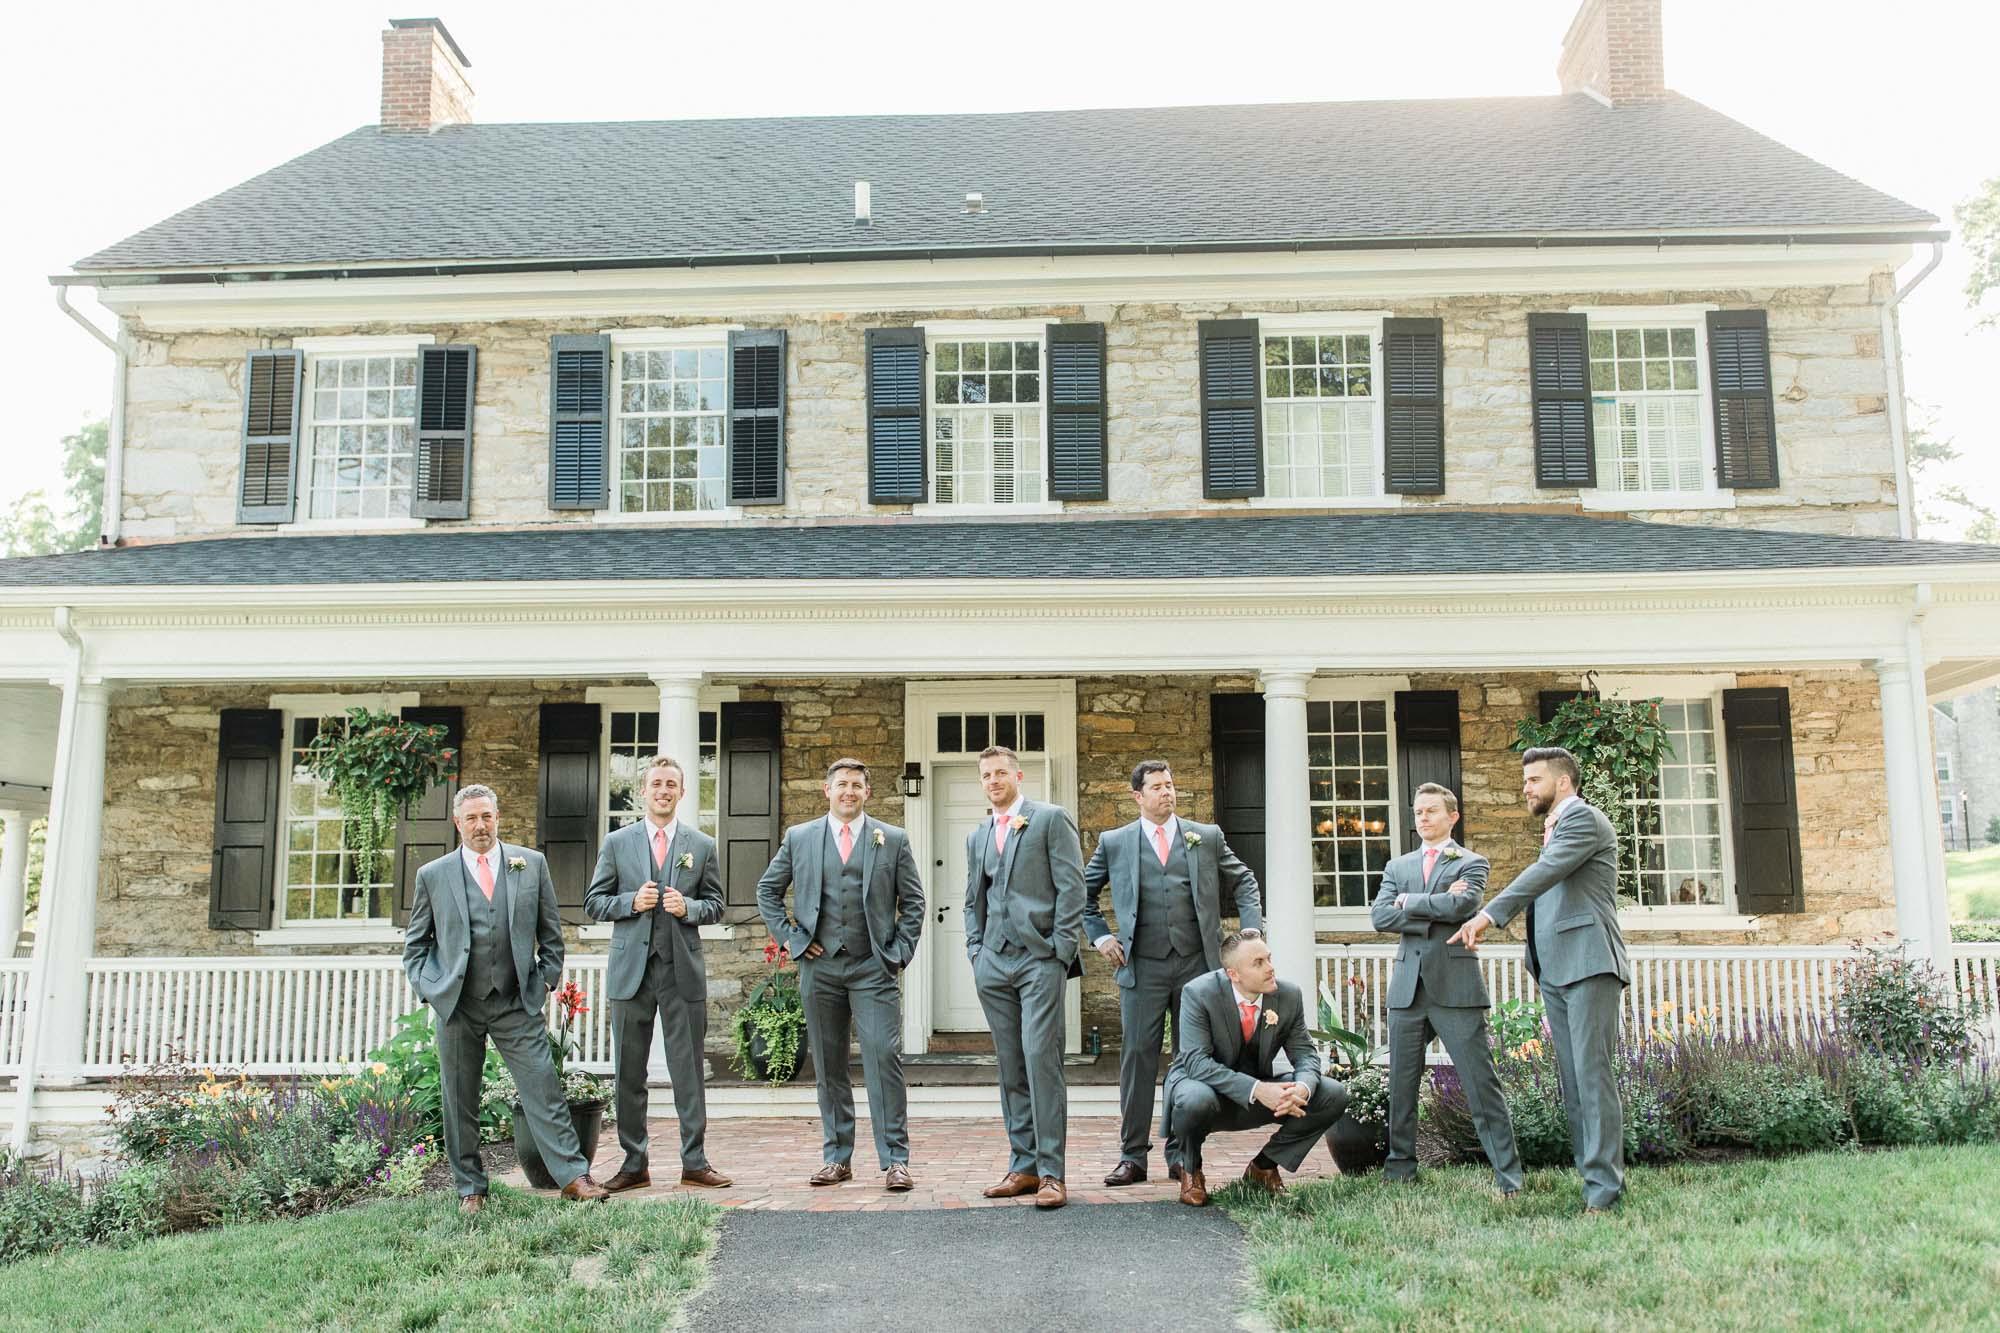 Allenberry-resort-historic-pennsylvania-wedding-10132.jpg